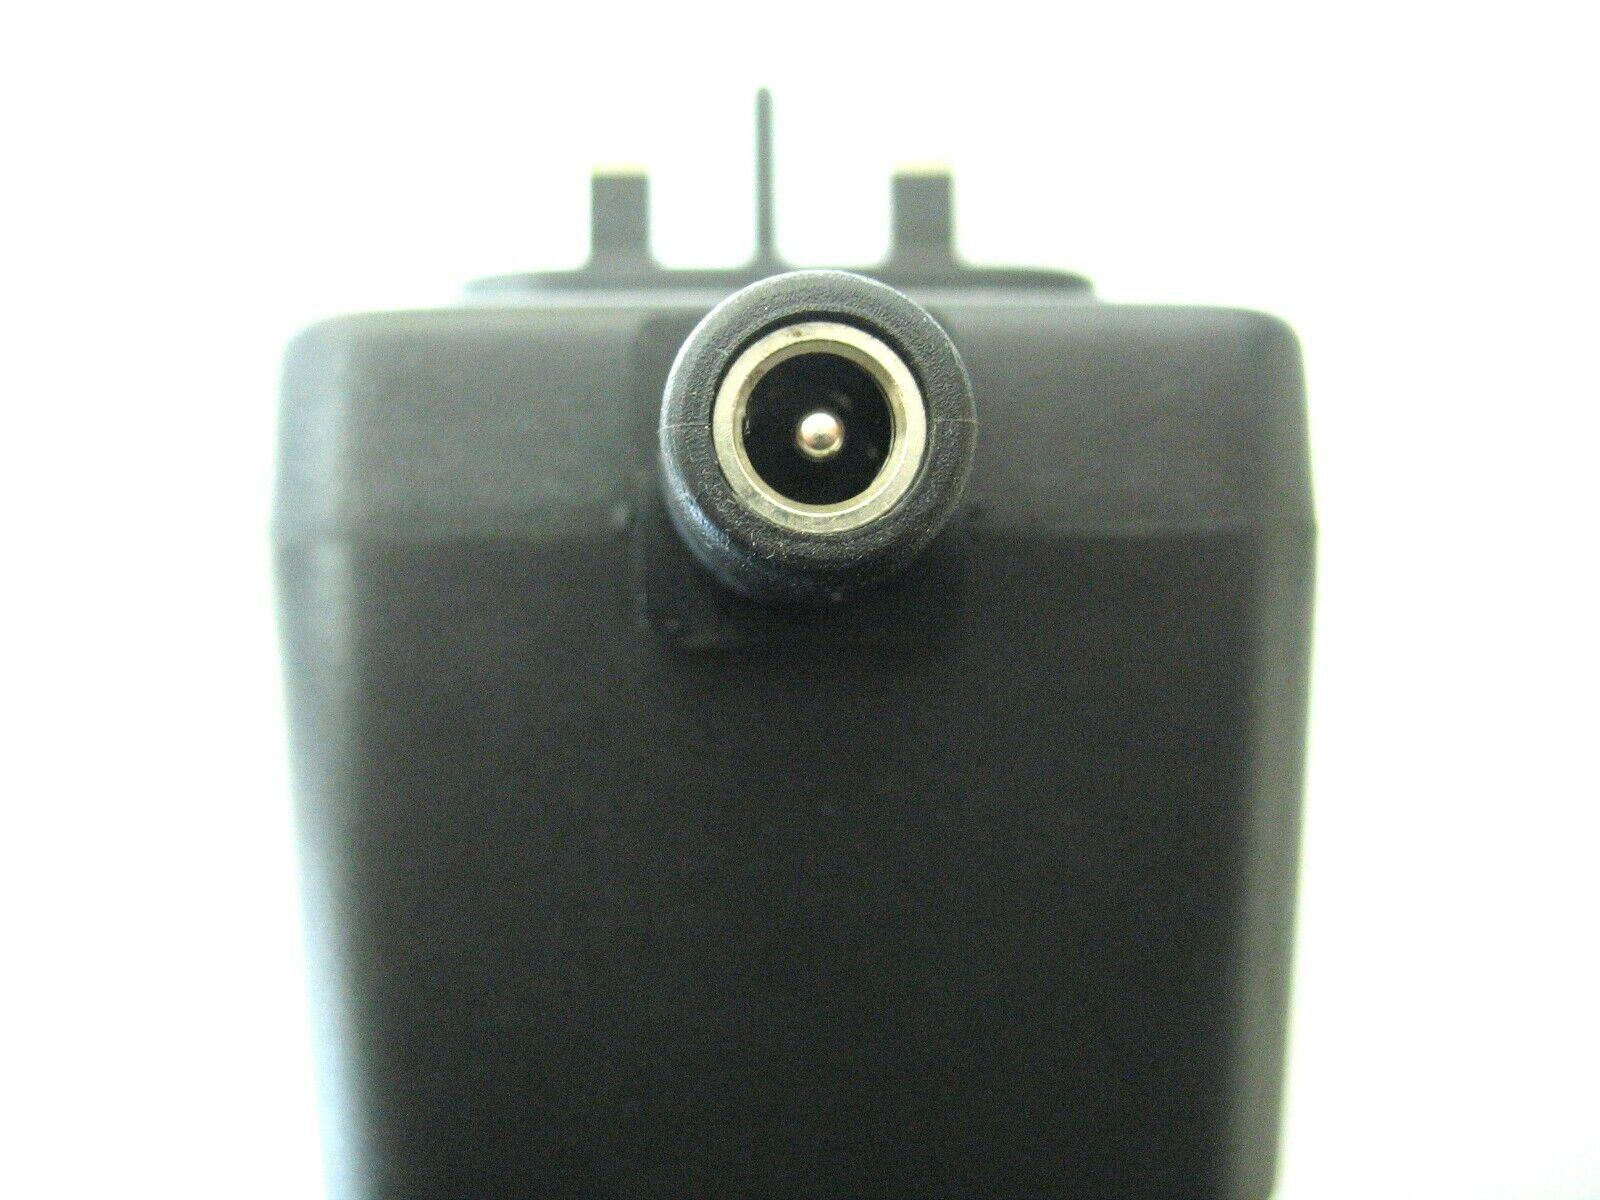 0.3 amp 32 volt Socket AC-DC (DC Output) Power Adaptor/Supply/Charger 9.6 watt